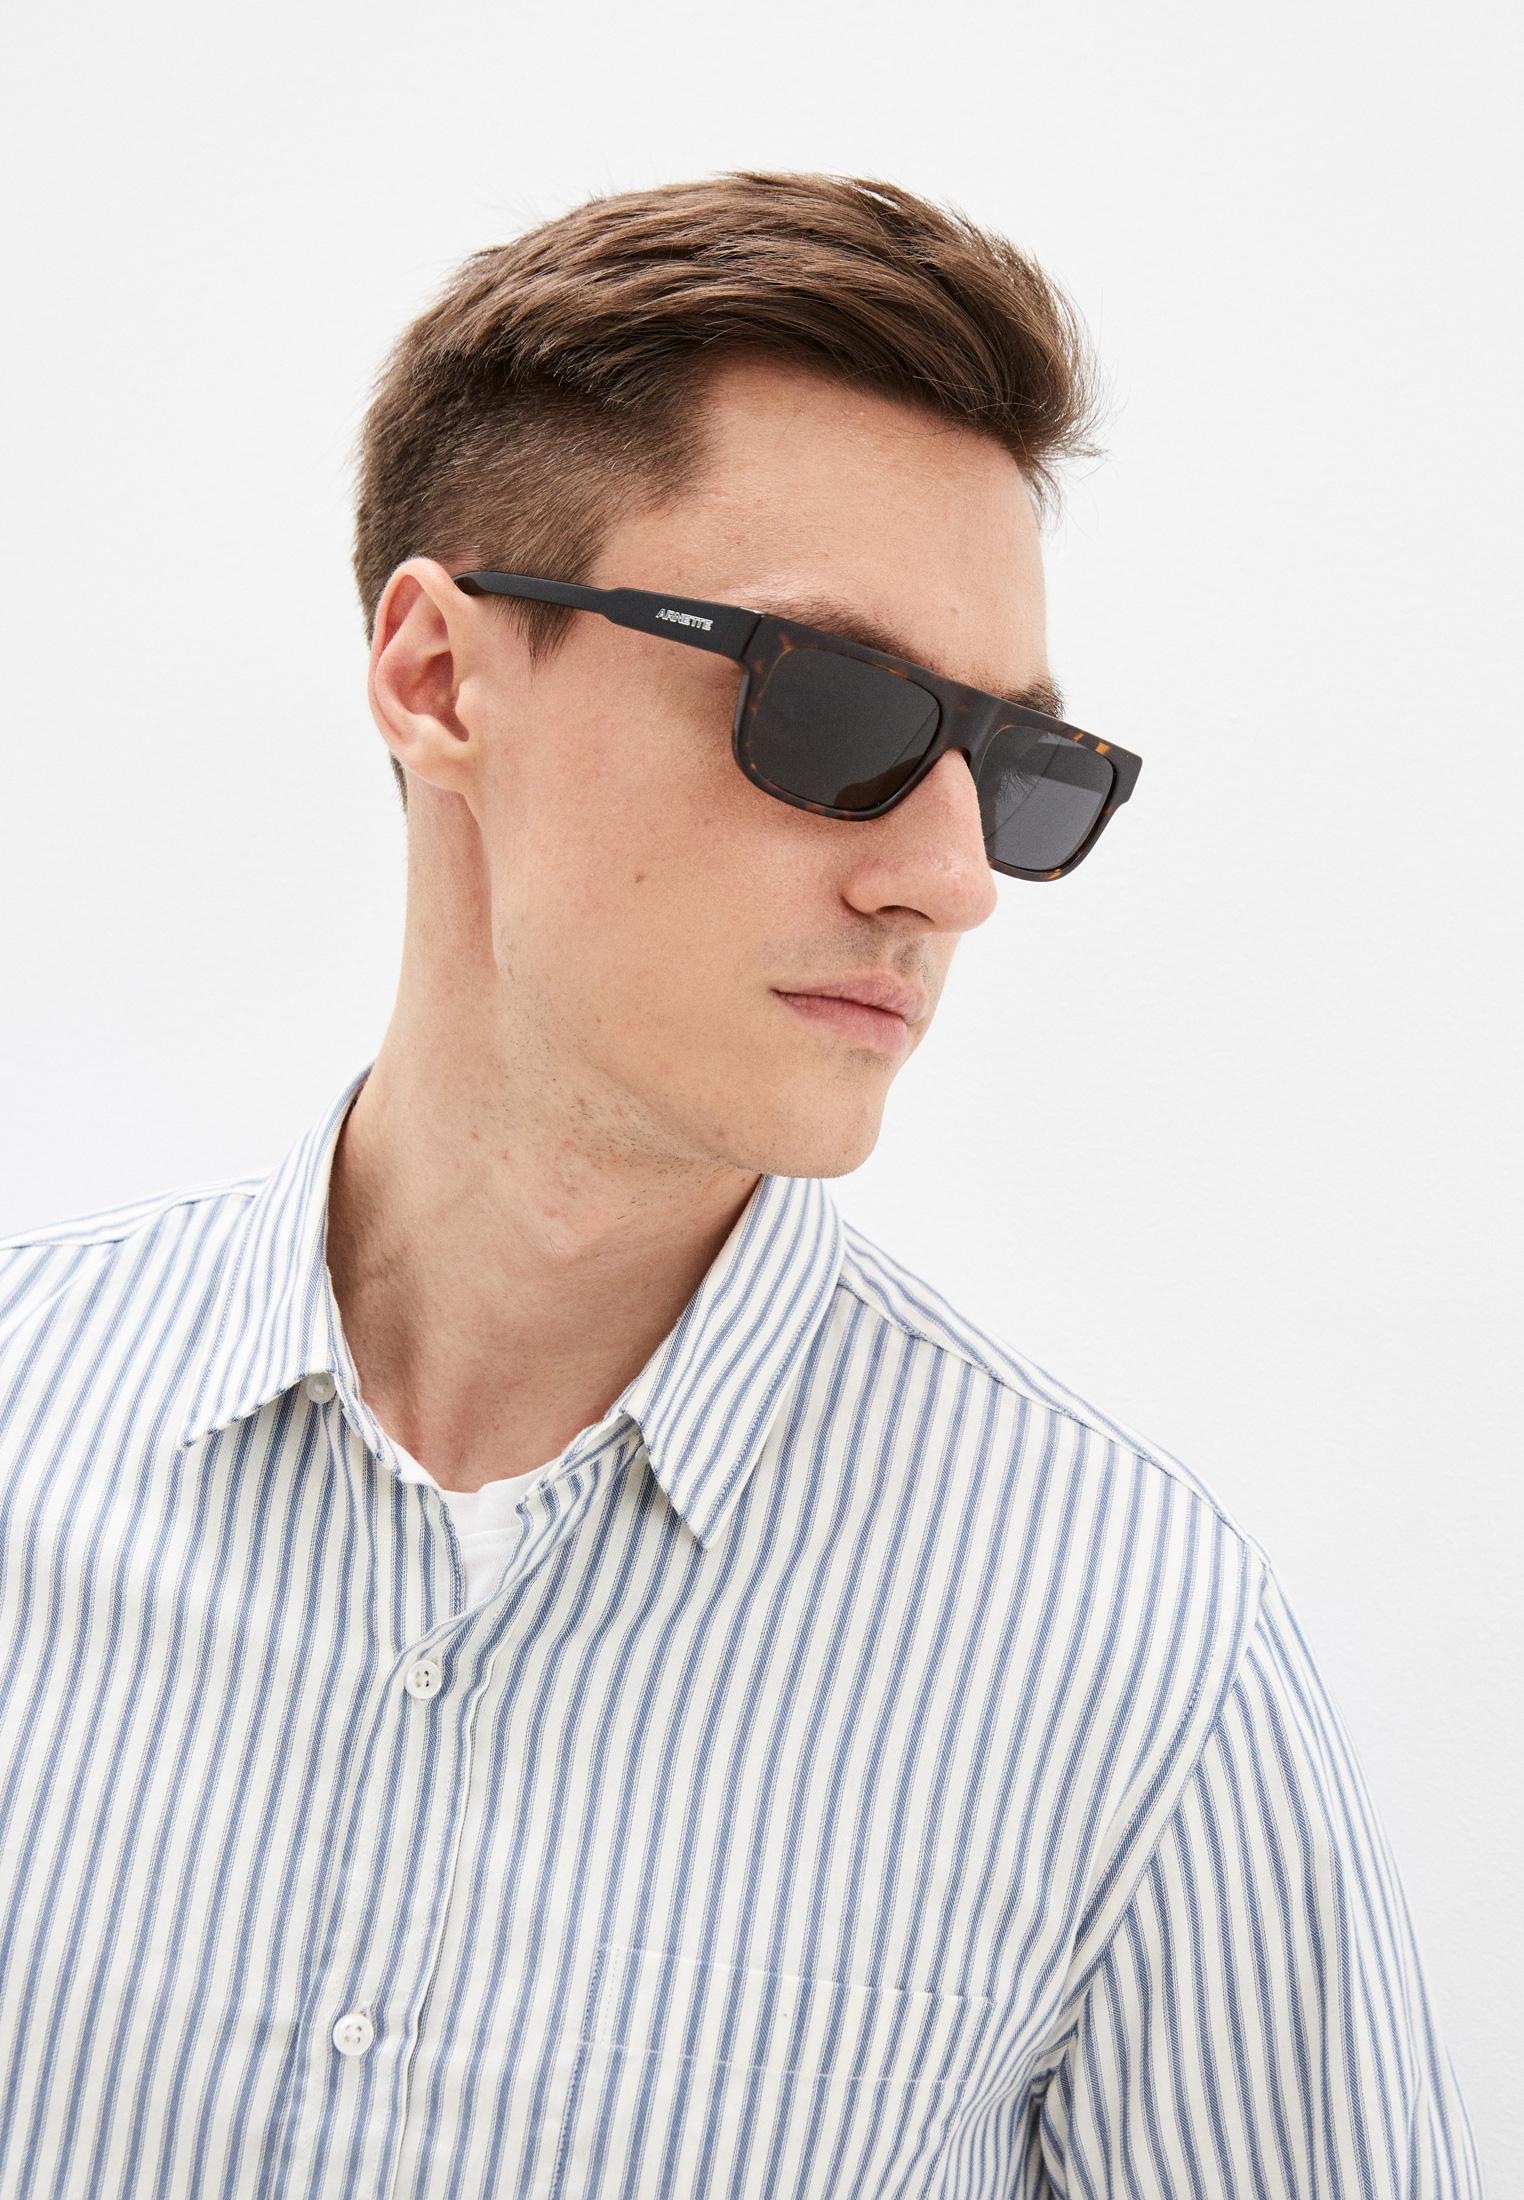 Мужские солнцезащитные очки ARNETTE Очки солнцезащитные Arnette